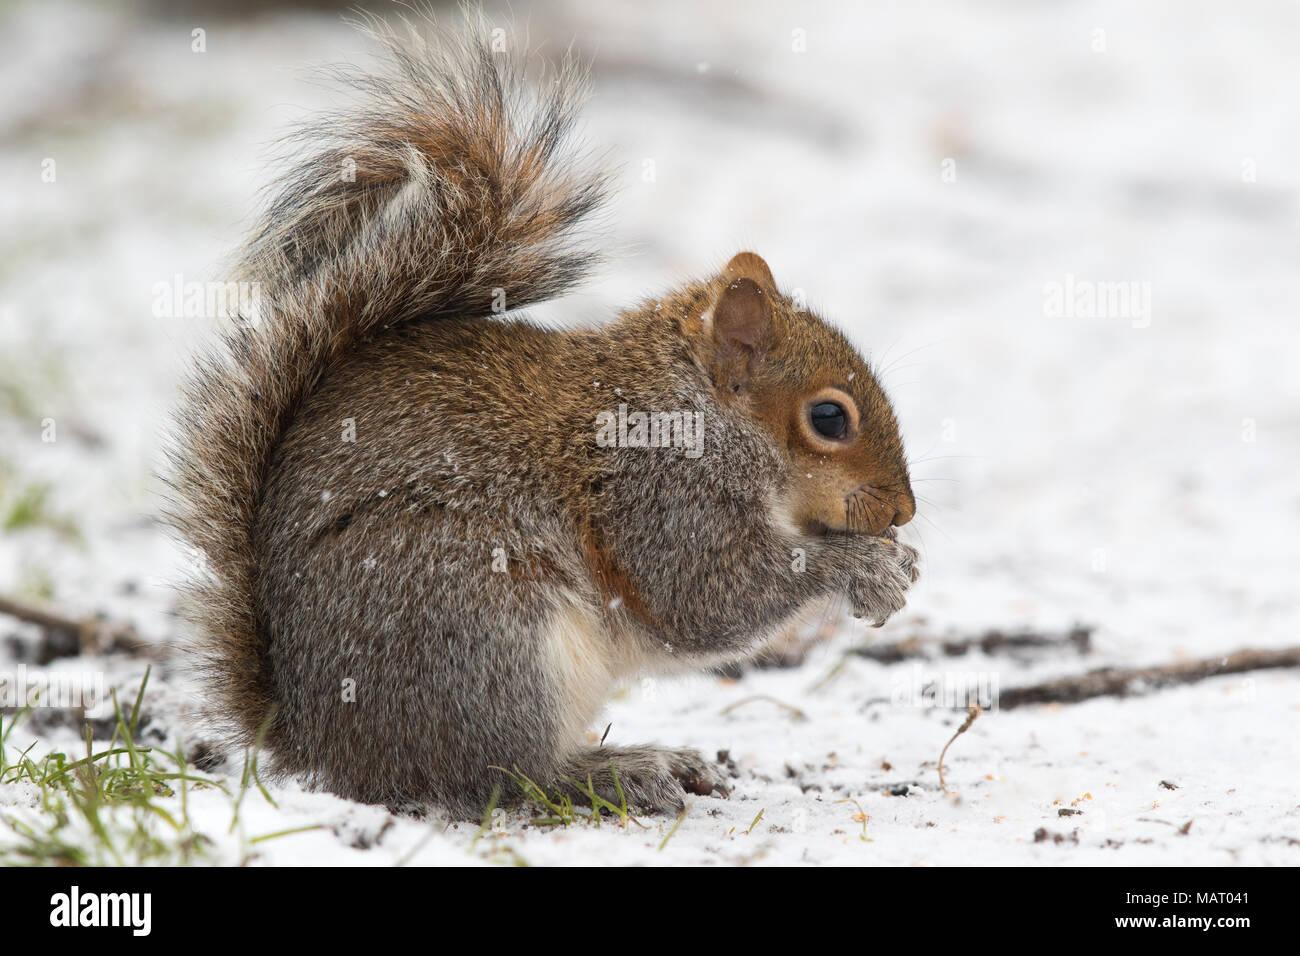 Eastern Grey Squirrel (Sciurus carolinensis) feeding on nuts in the snow - Stock Image